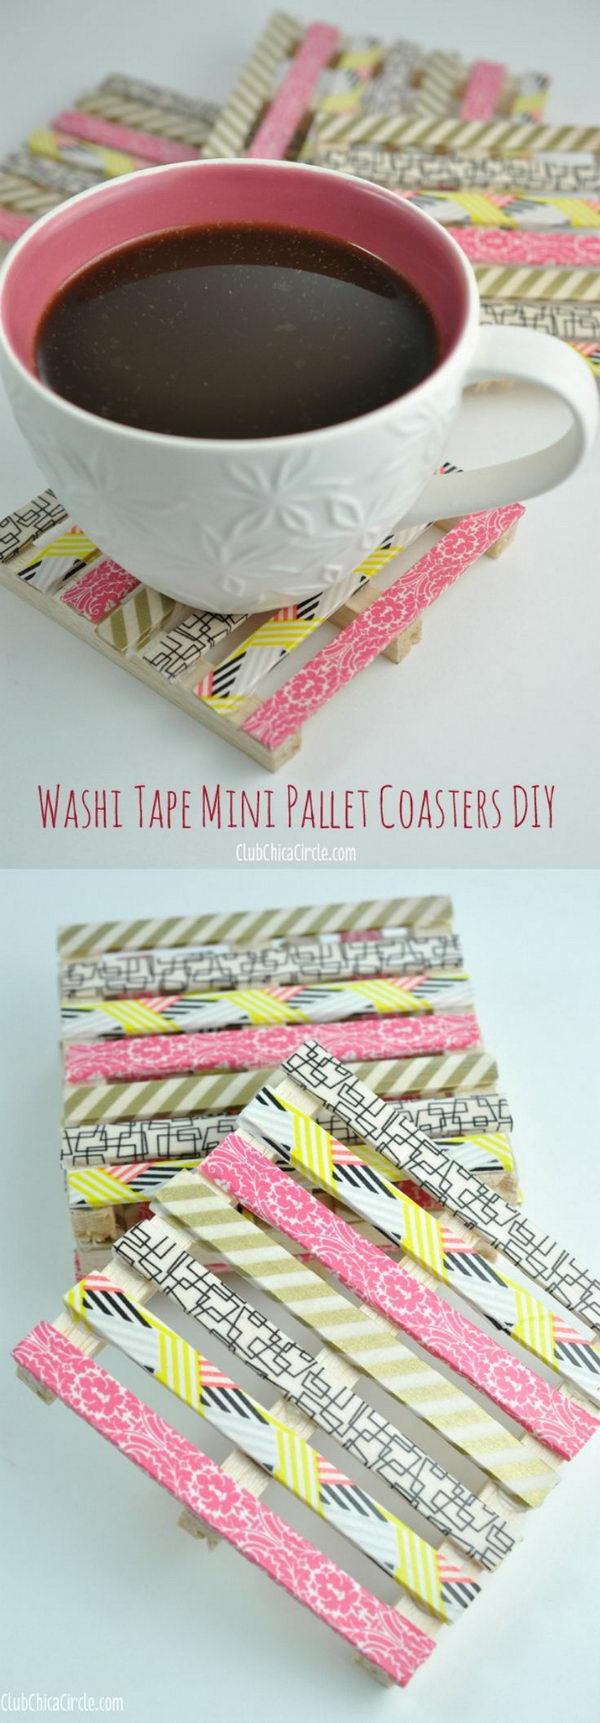 2 Washi Tape Mini Wood Pallet Coasters